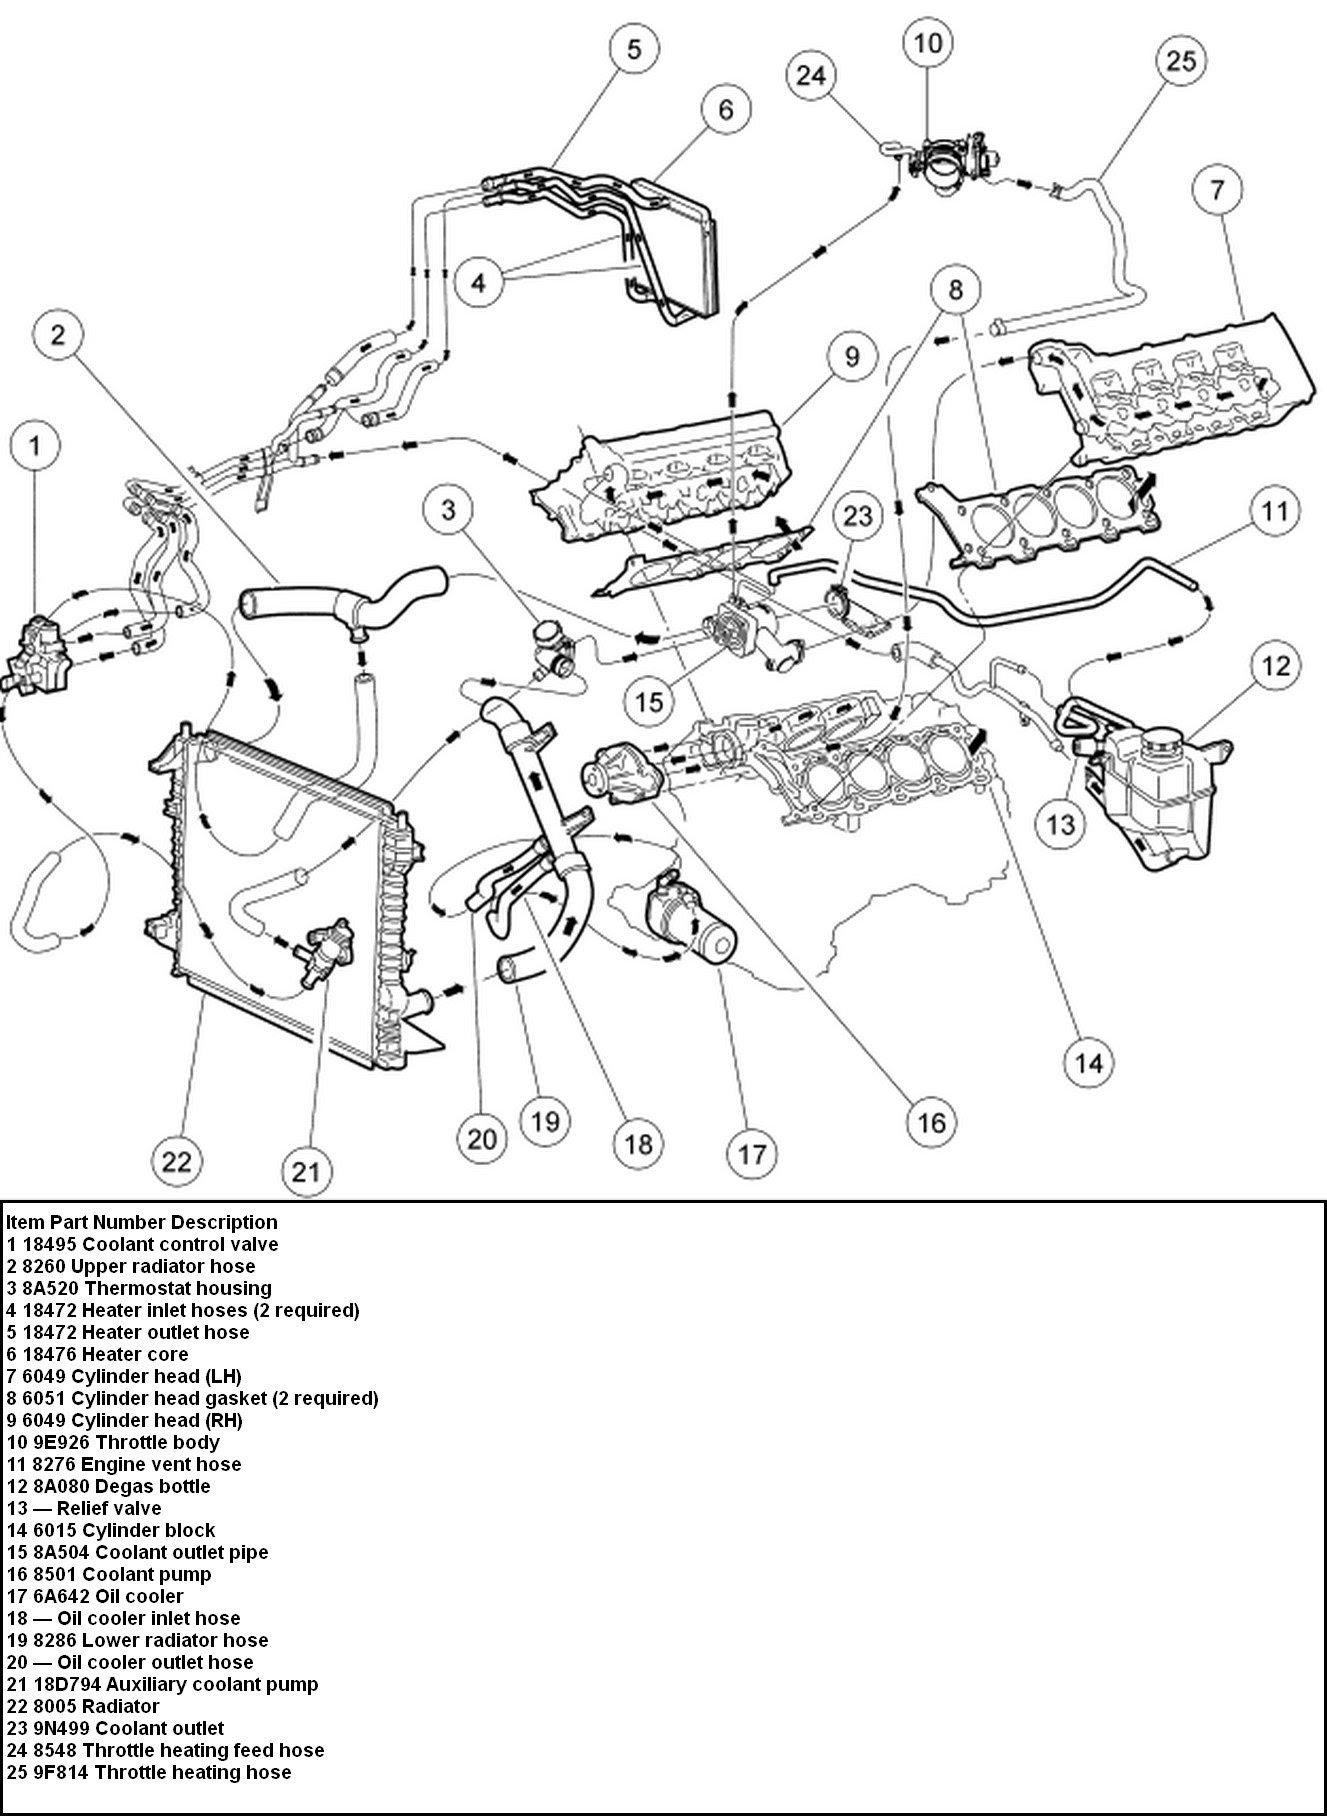 2002 Lincoln Ls Engine Diagram Wiring Diagram Schema Doug Track Doug Track Atmosphereconcept It